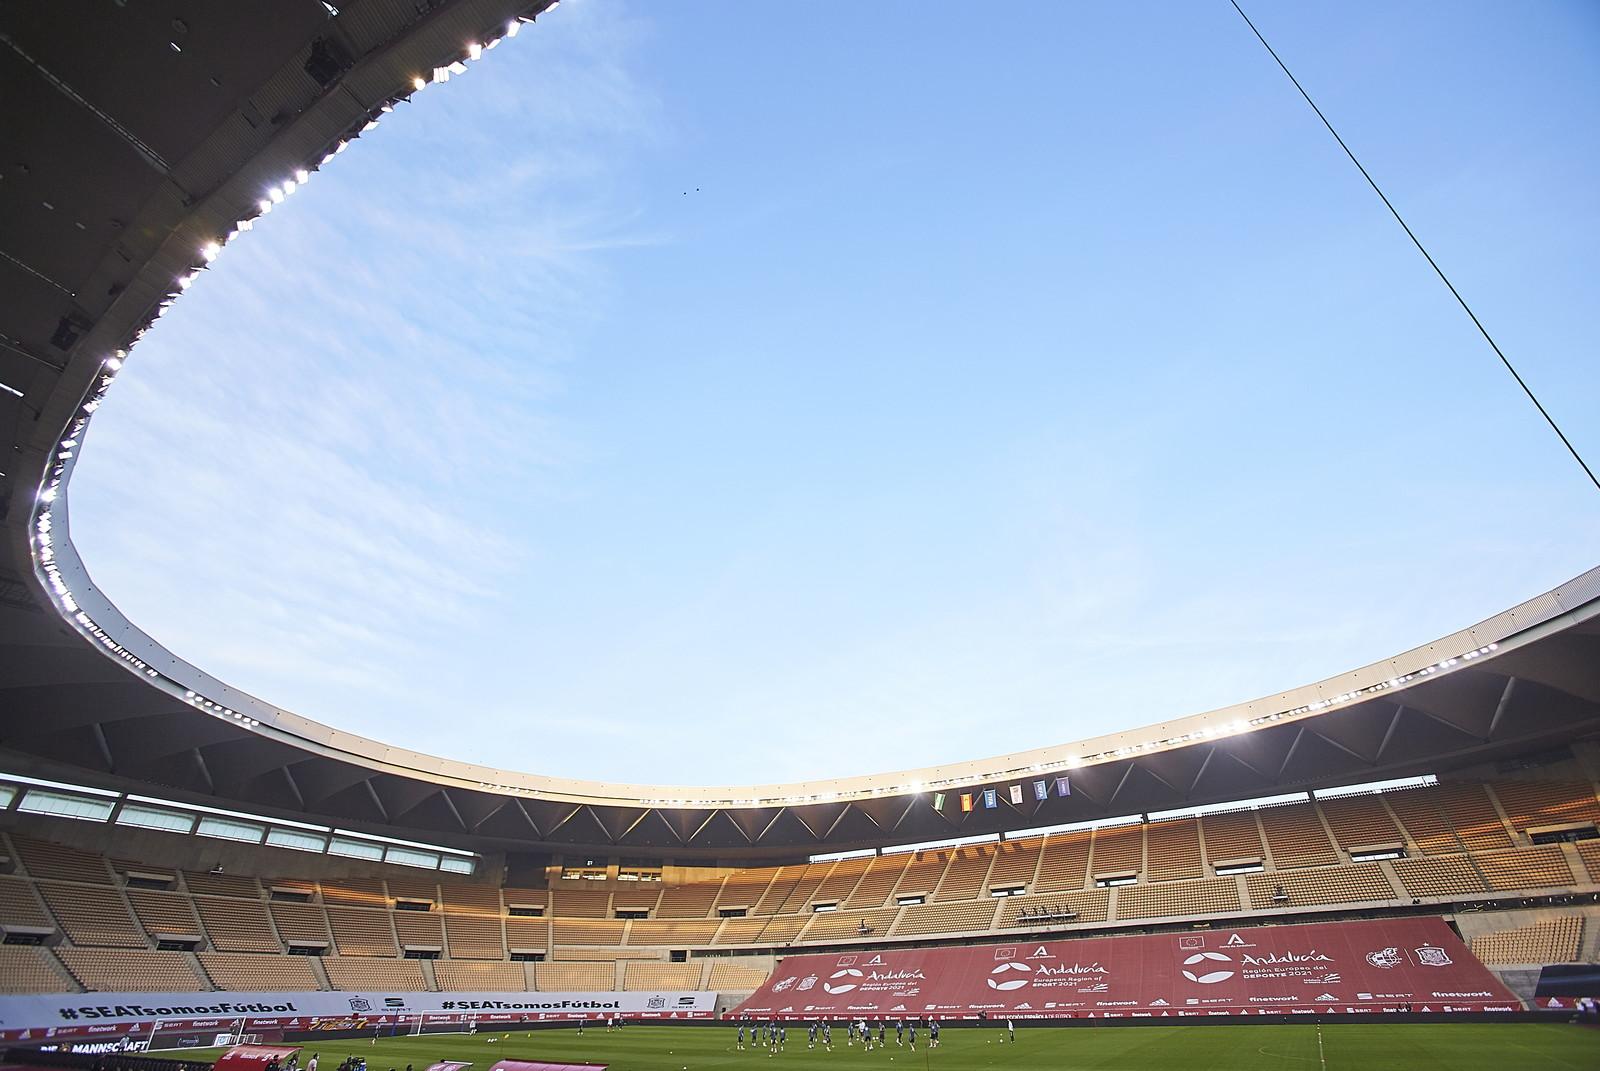 Siviglia - Stadio Cartuja Sevilla